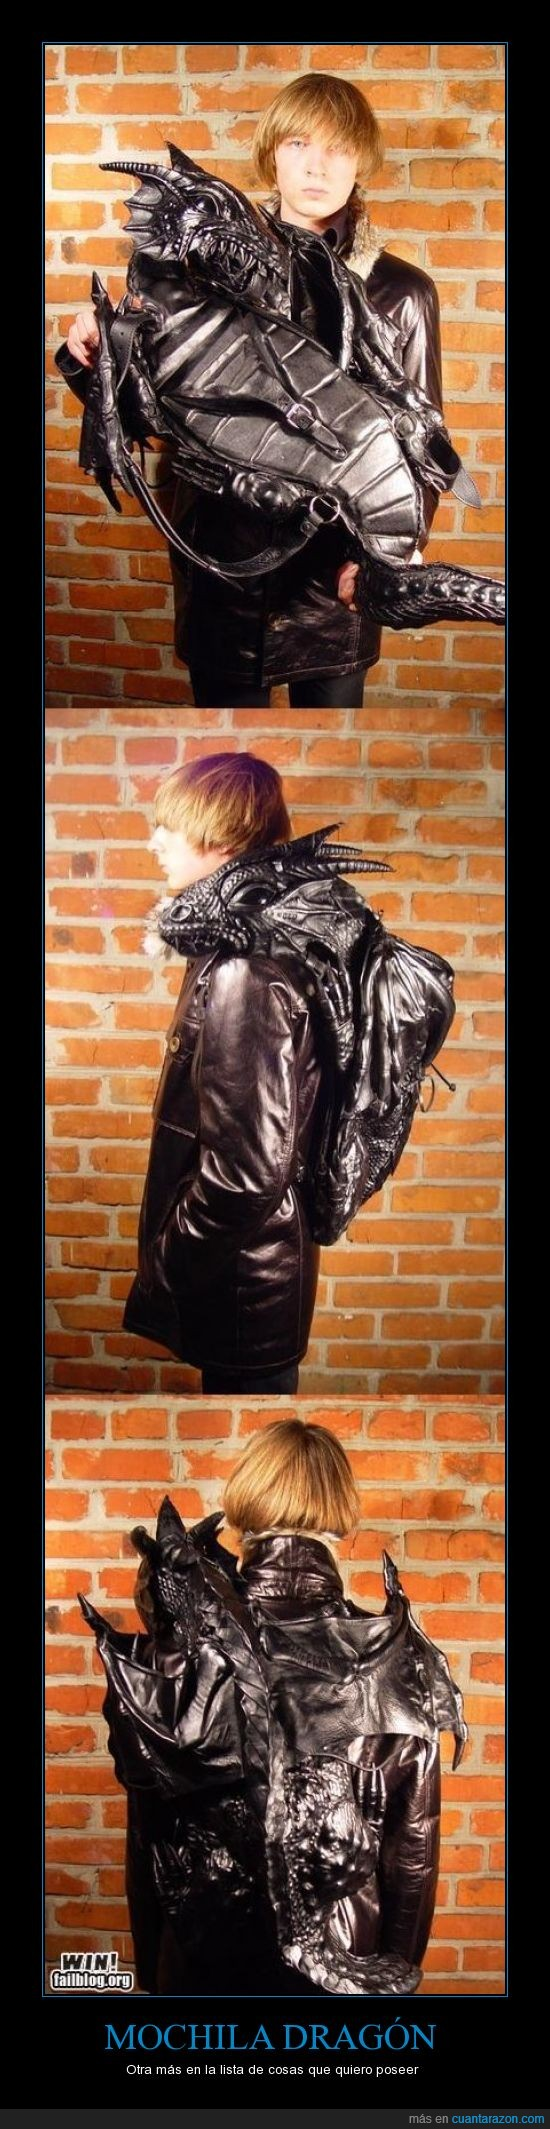 dragón negro,mascota,mochila